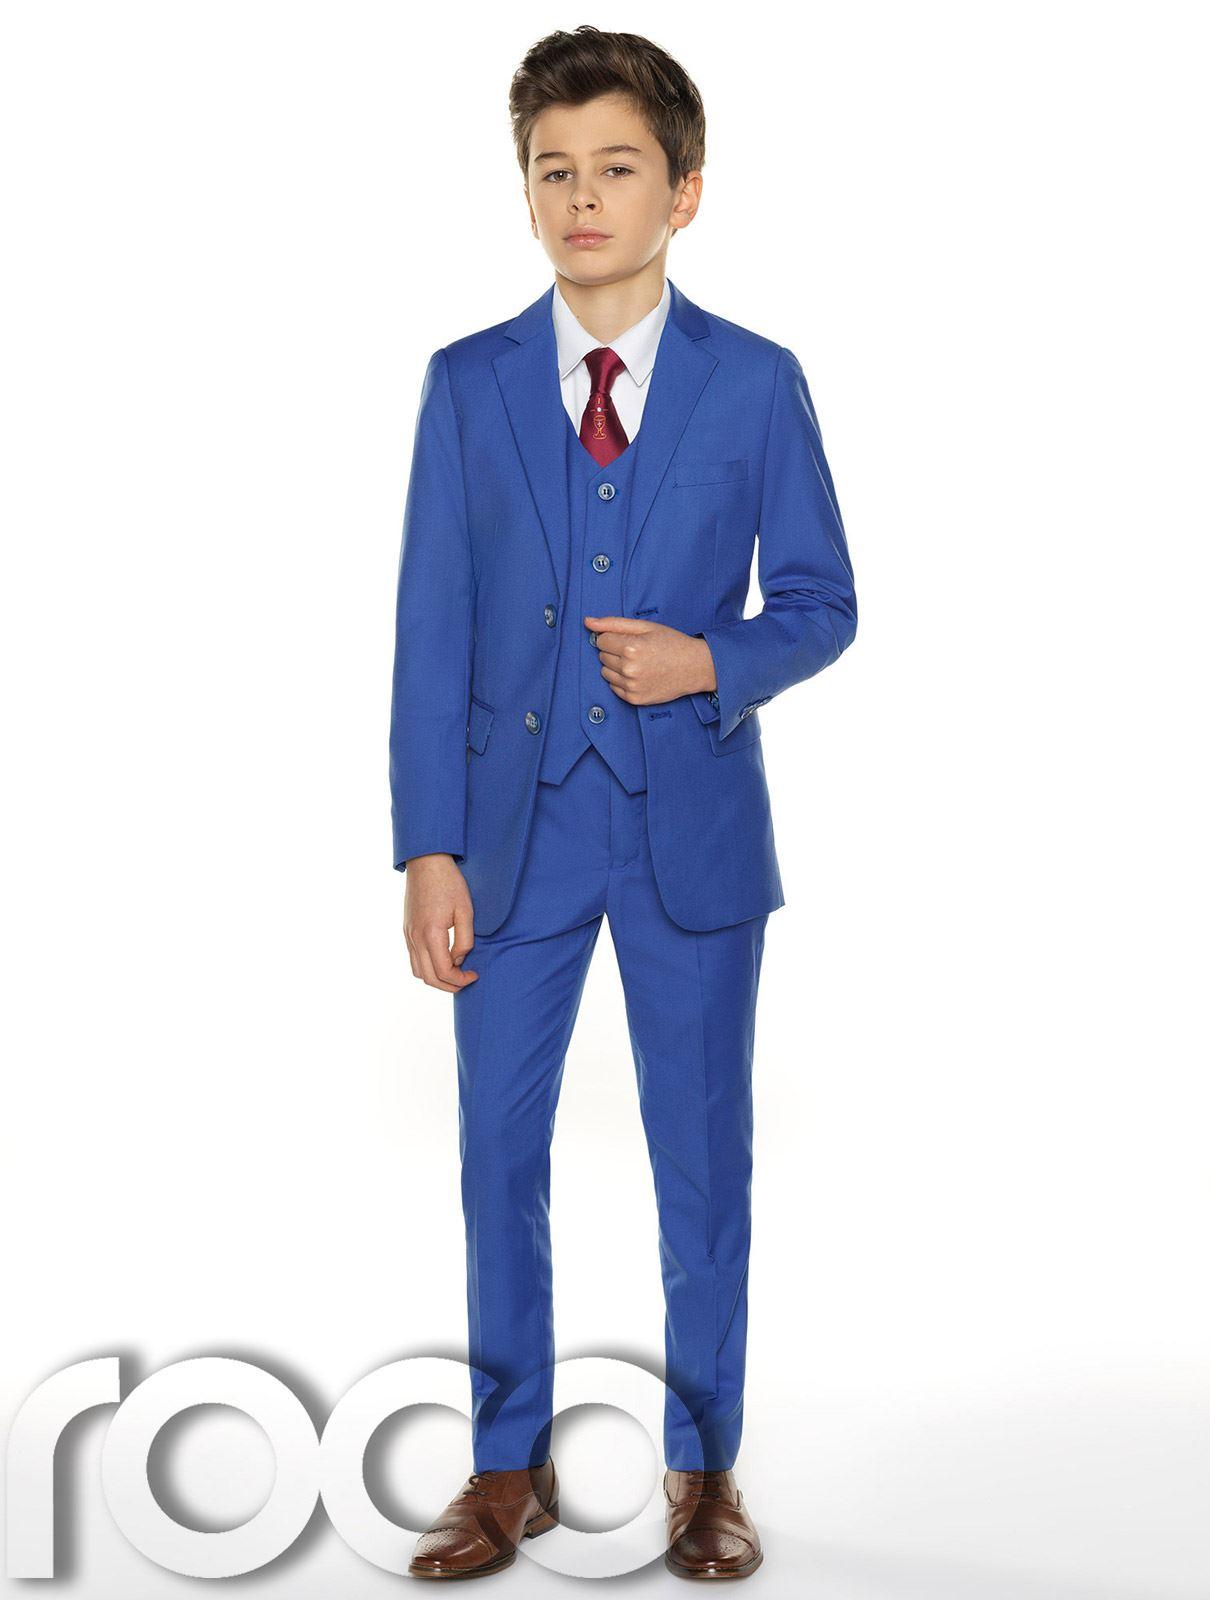 Garcons-Costume-Bleu-Communion-Costume-Bleu-Communion-Costume miniature 11